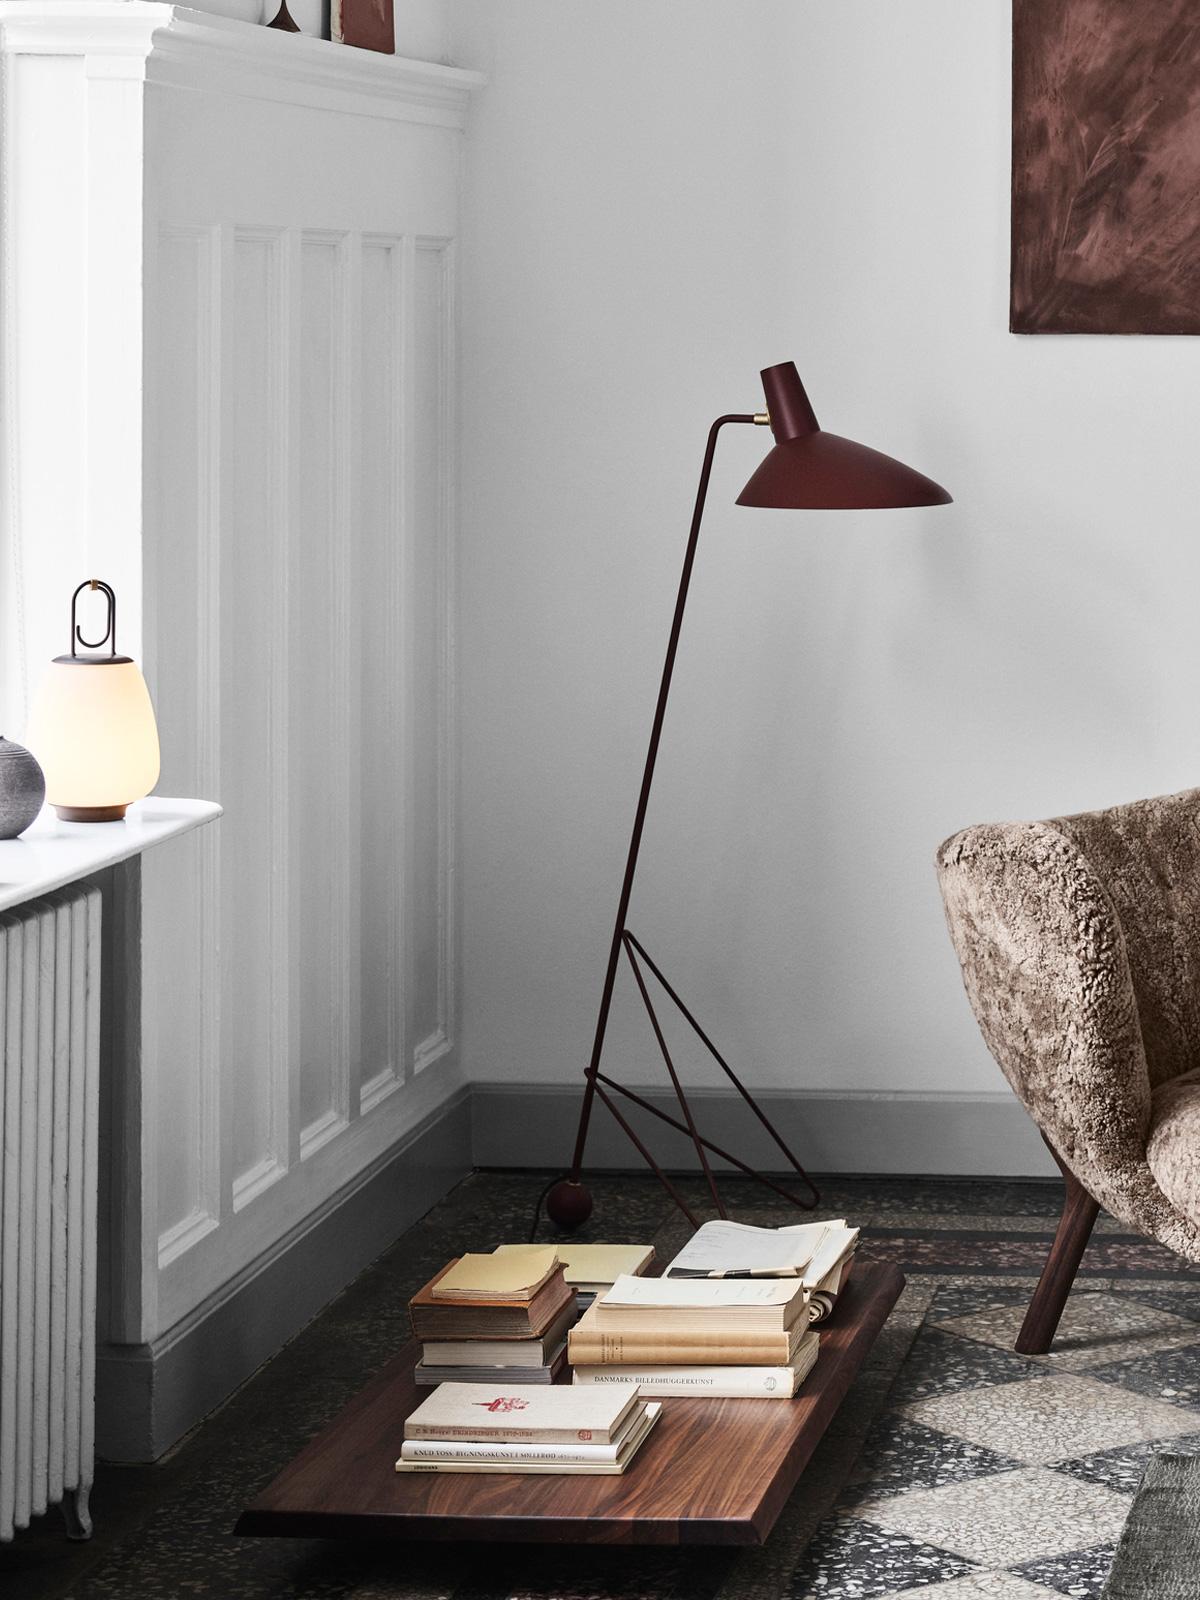 Tripod HM8 &tradition DesignOrt Onlineshop Lampen Berlin